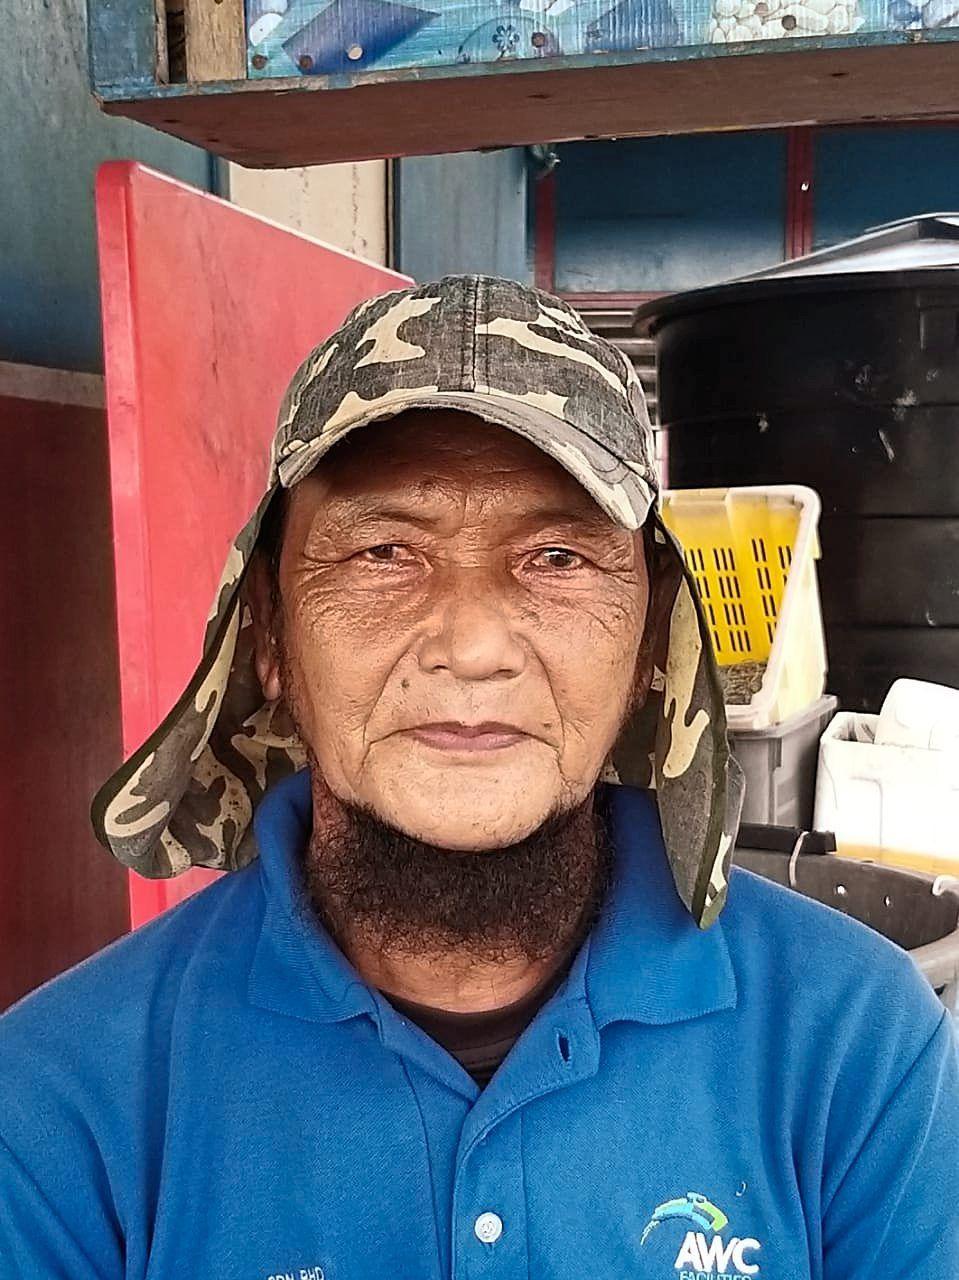 Kamaruzaman says fishermen travel as far as Pulau Merambong, about 20km away, to fish.